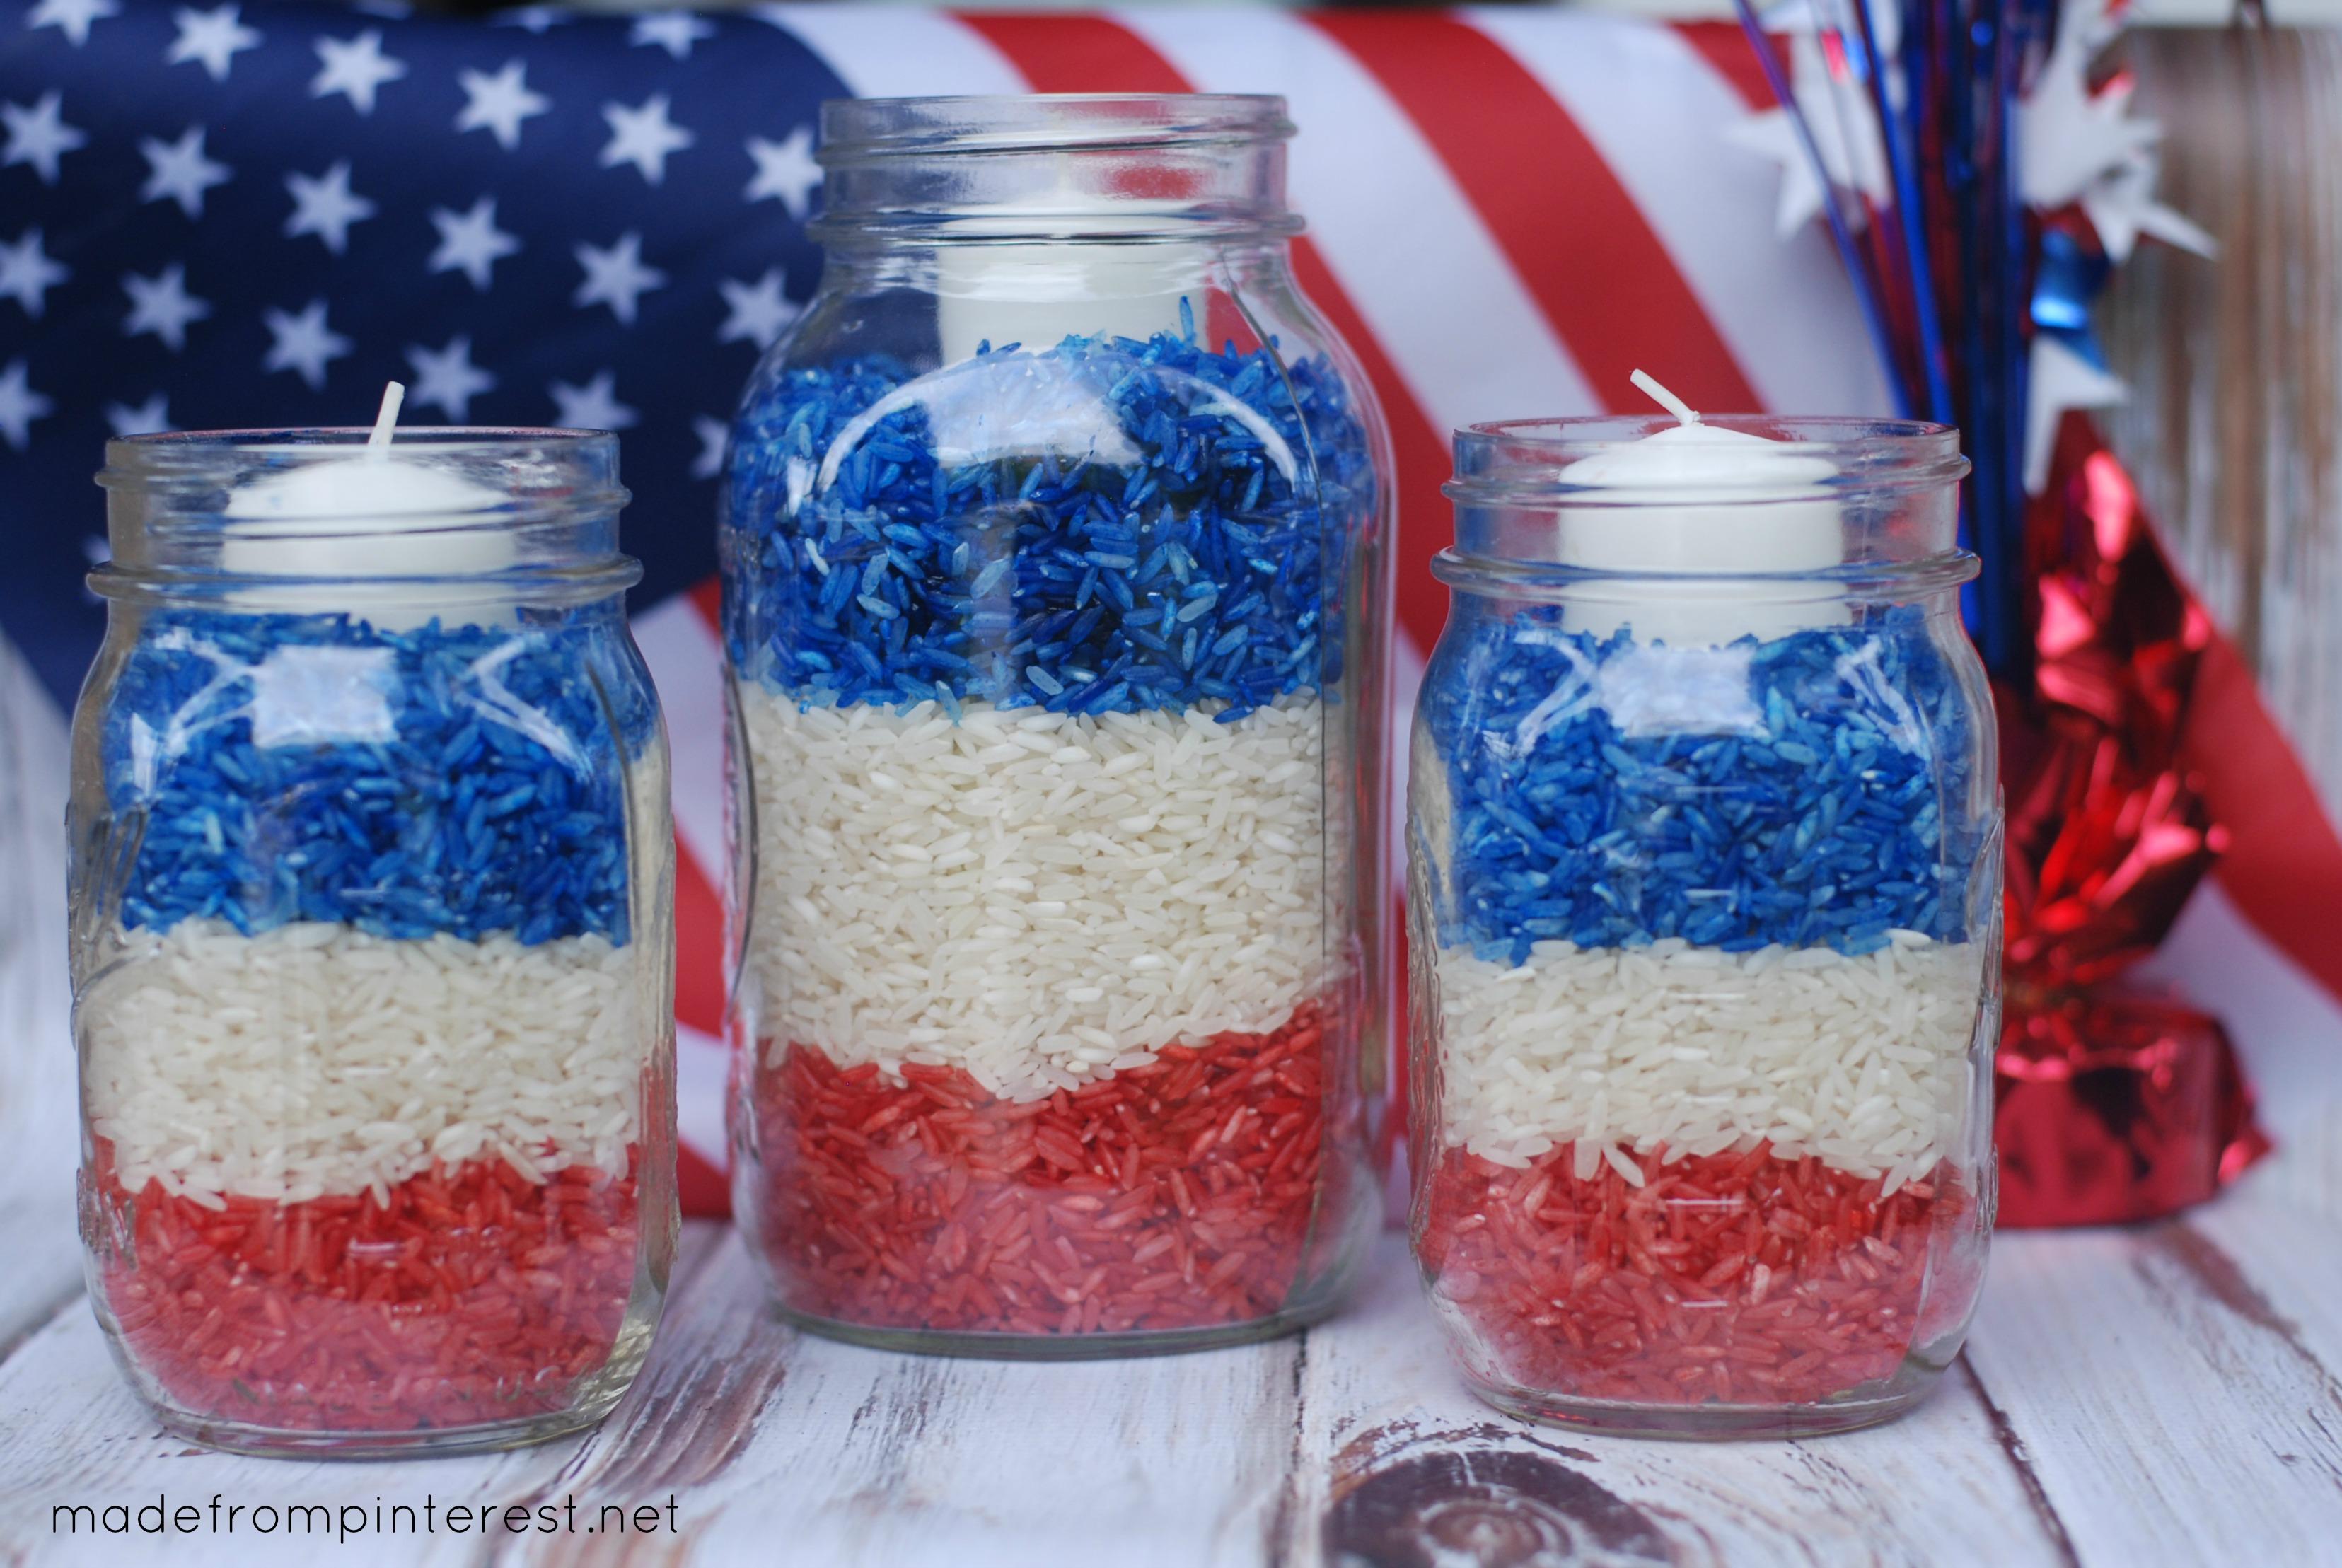 Patriotic Home Decor Ideas 4th Of July Mason Jar Candles Tgif This Grandma Is Fun